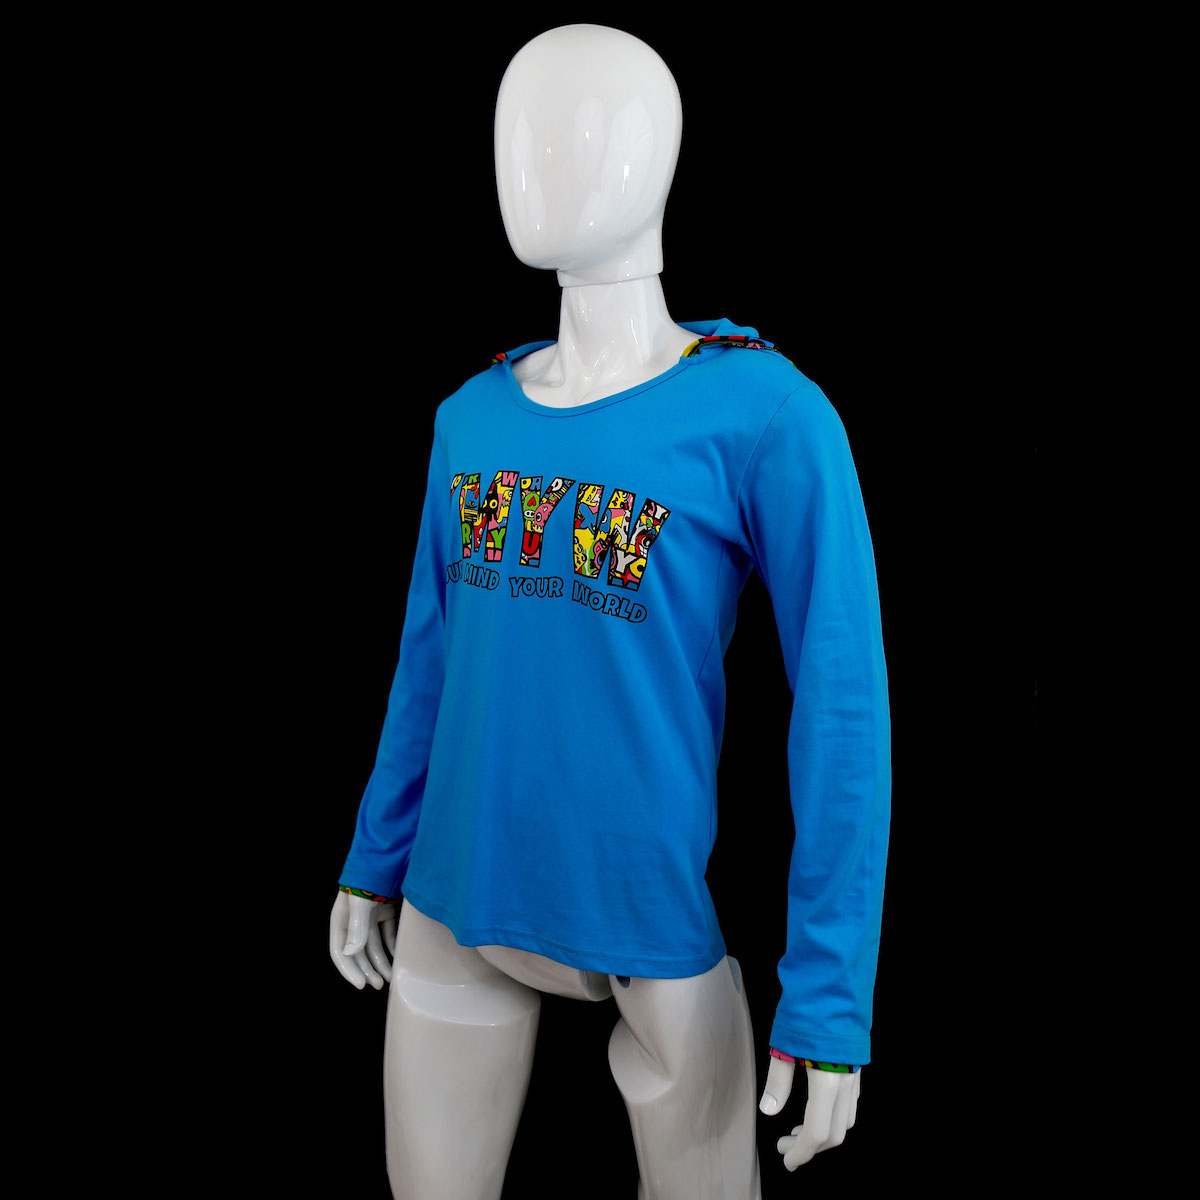 Cool Sweatshirts For Men, Buy Mens Sweatshirts